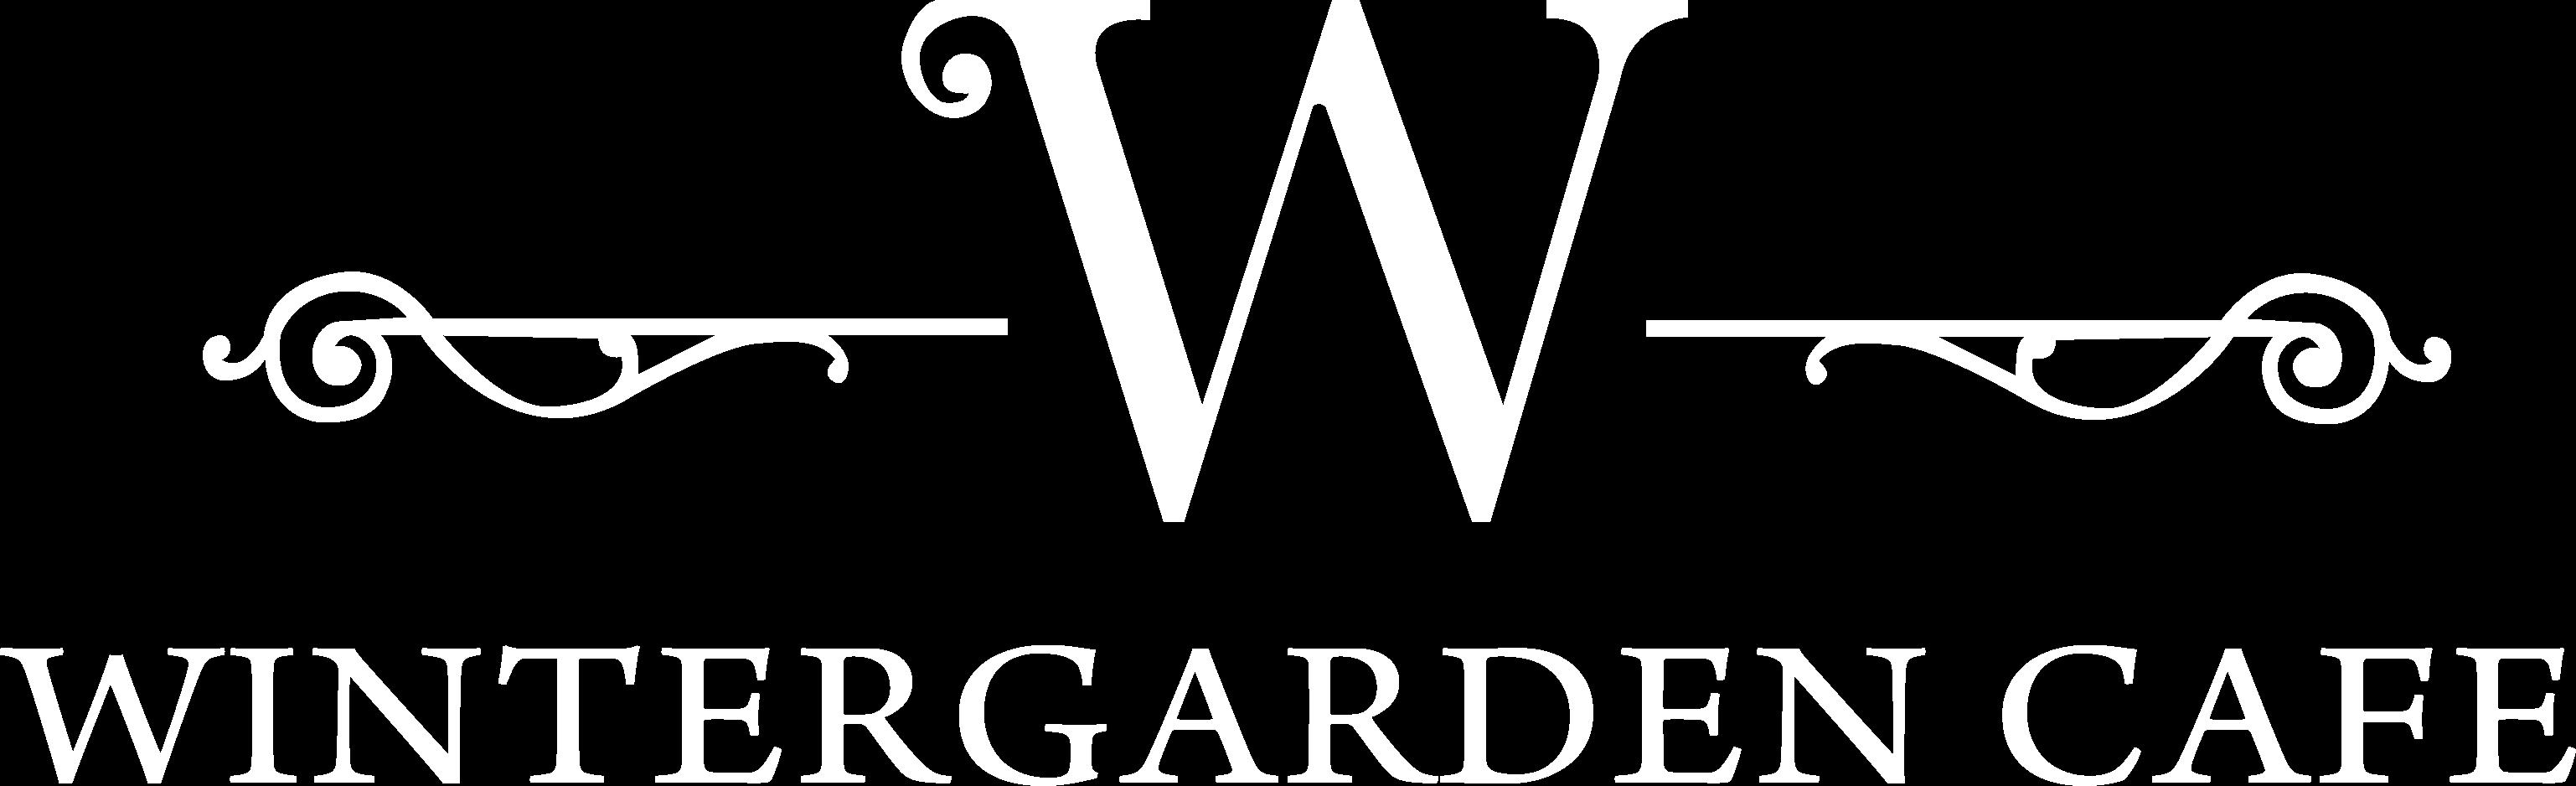 Wintergarden Pavilion Cafe